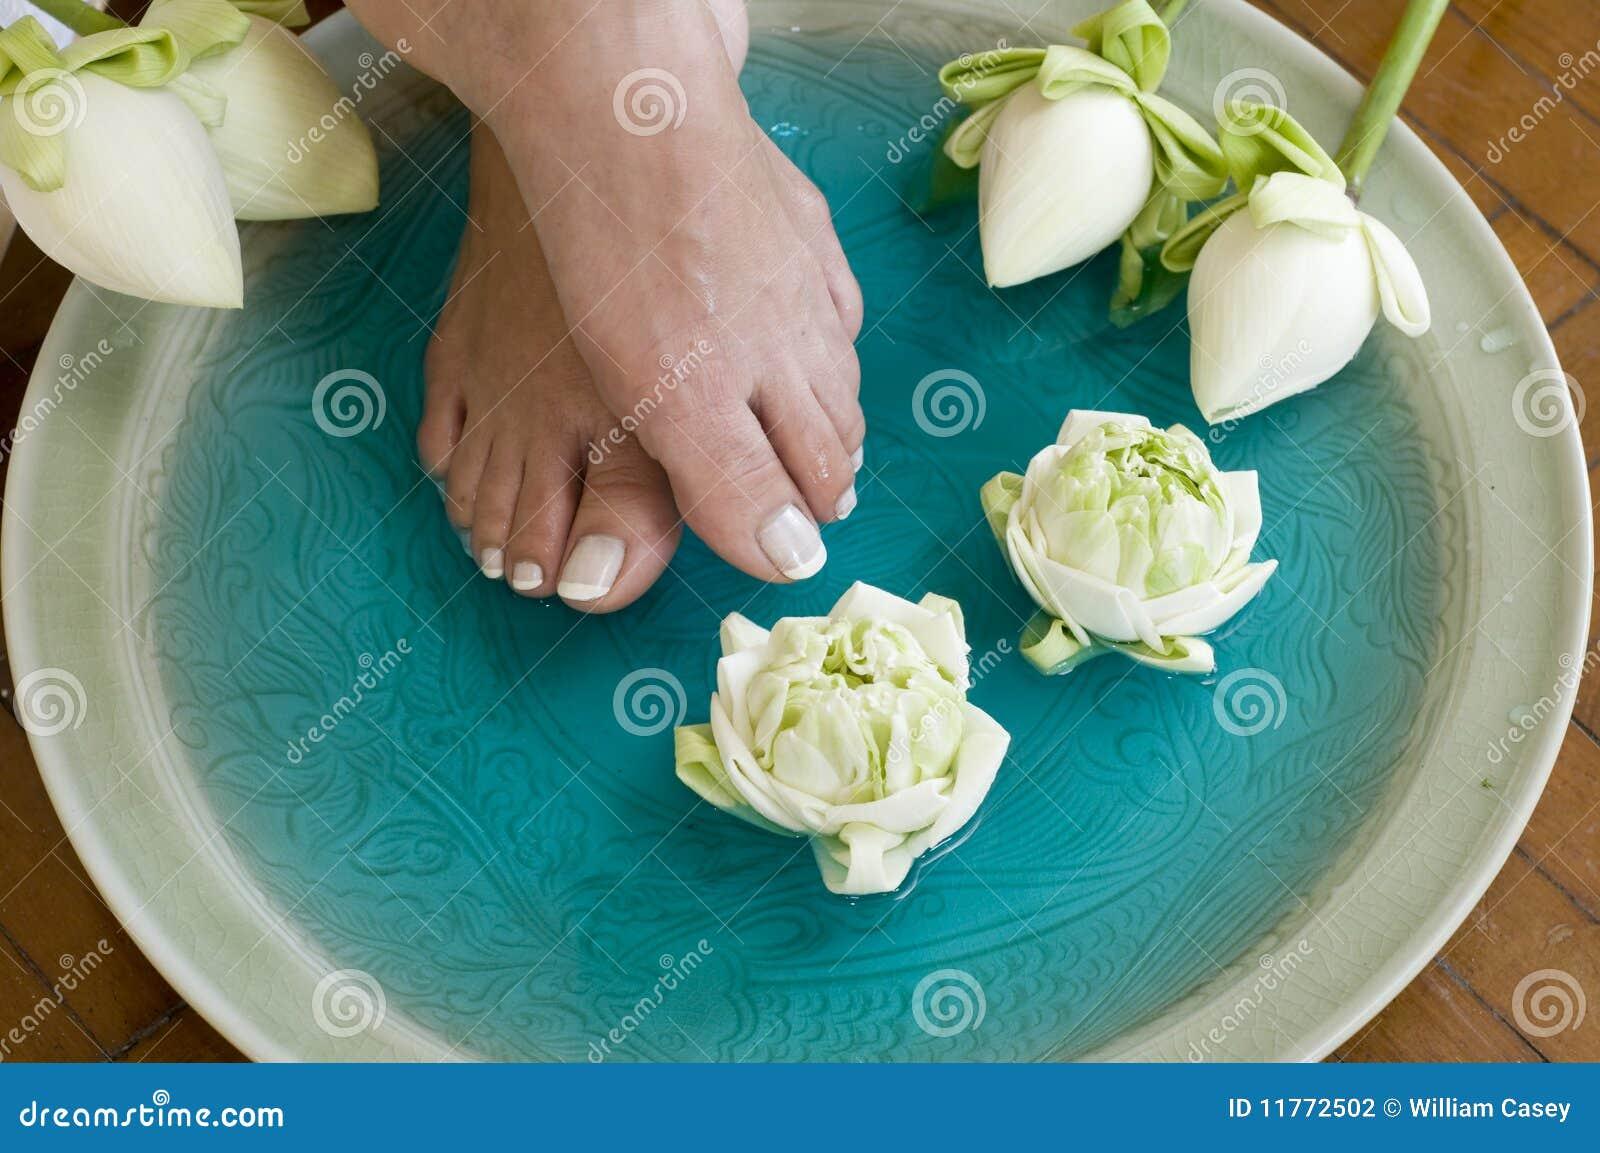 Lotus Flower Aromatherapy Spa For Feet 4 Stock Photo Image Of